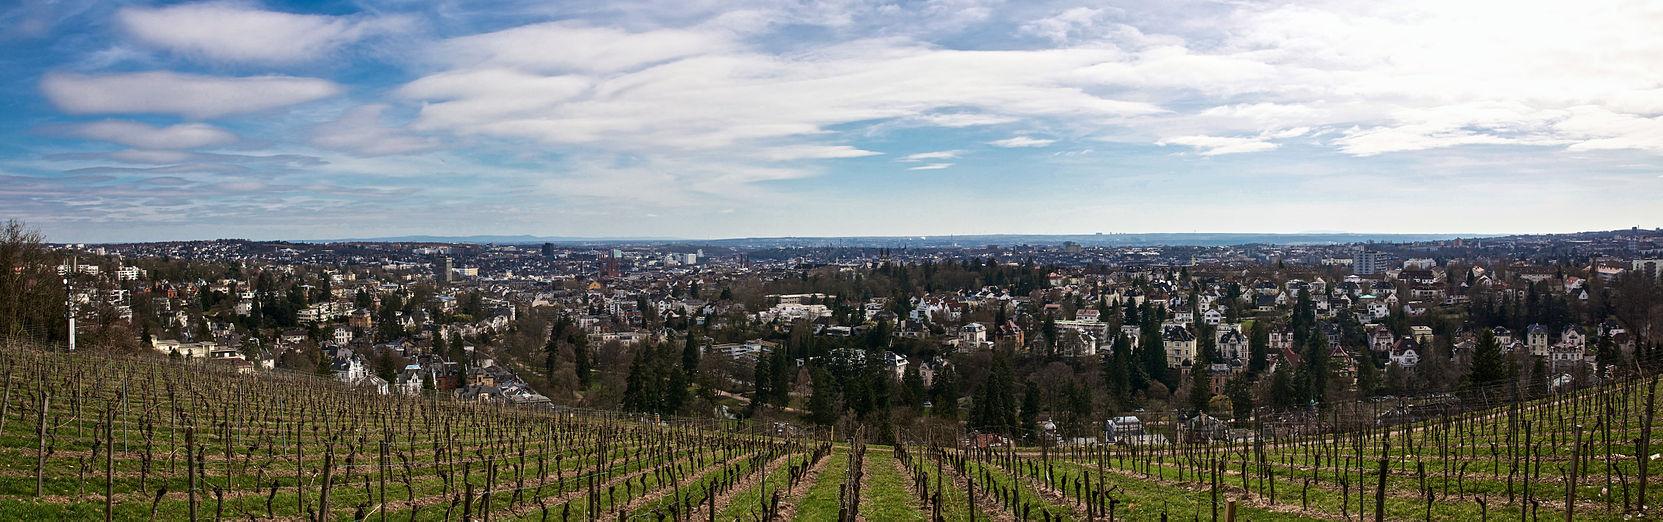 Panorama over Wiesbaden fra Neroberg.